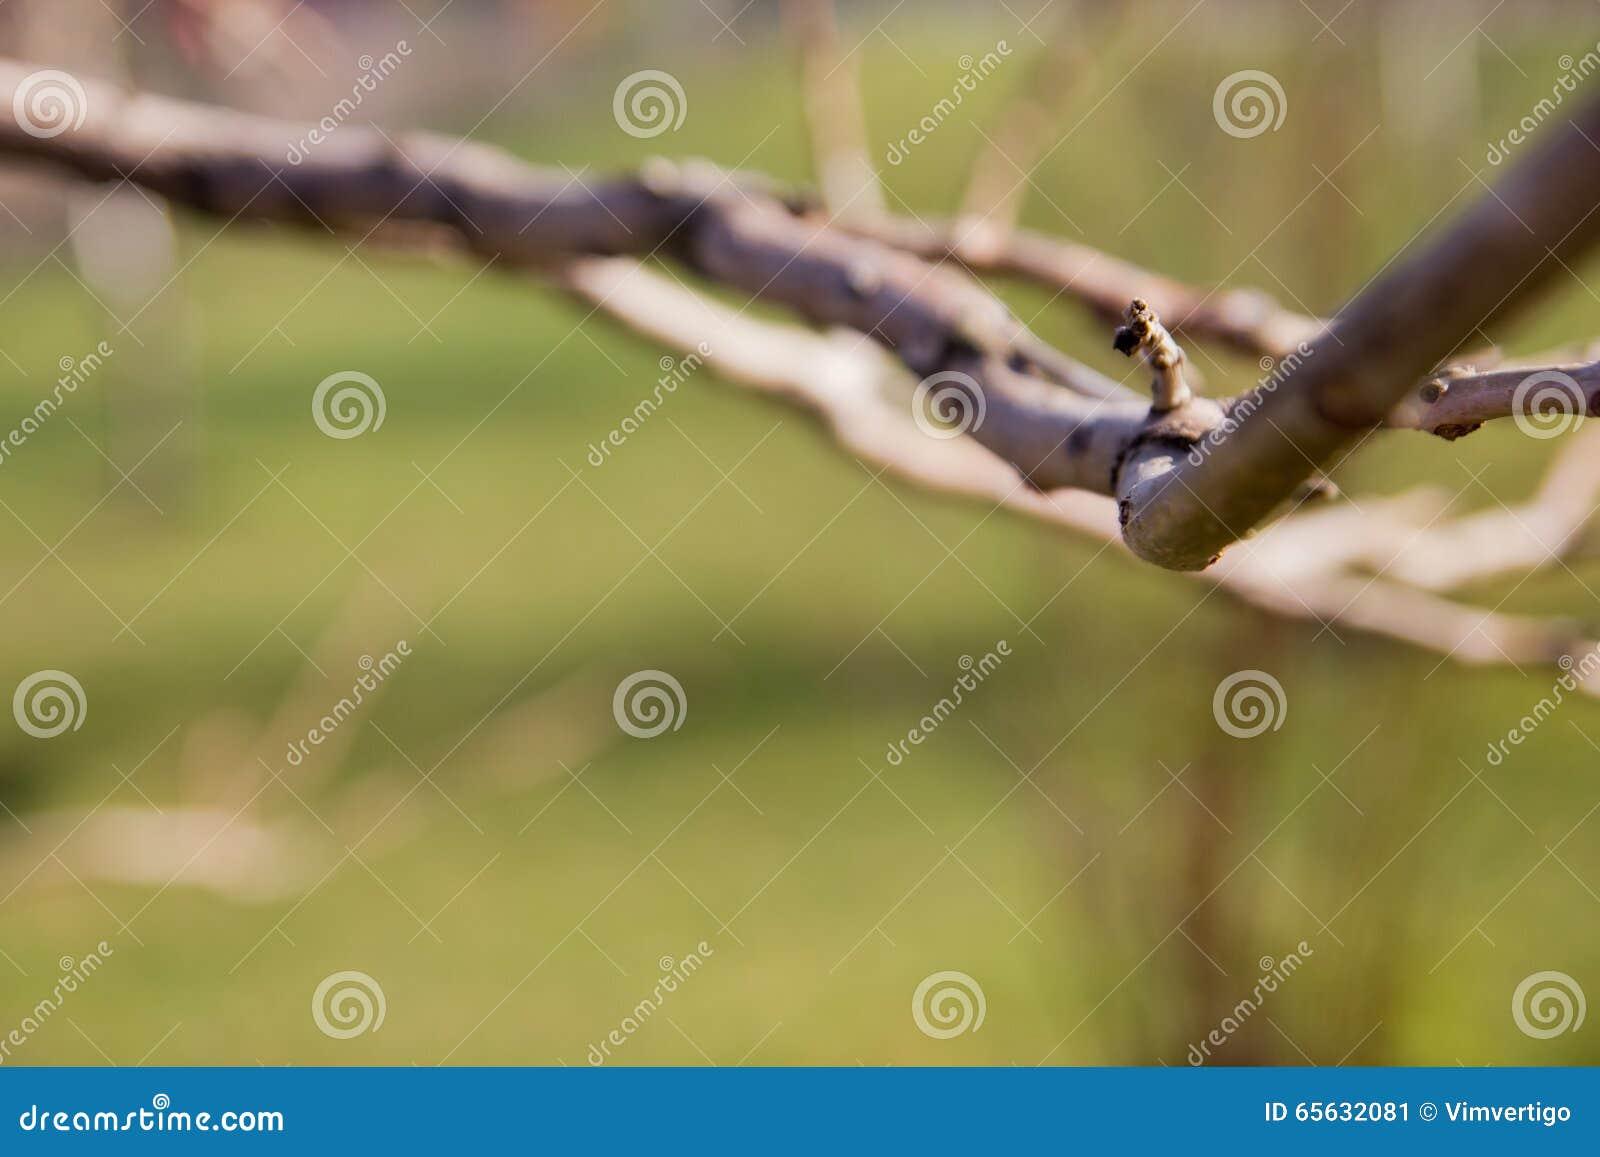 Fond vert abstrait ensoleillé de nature, foyer sélectif